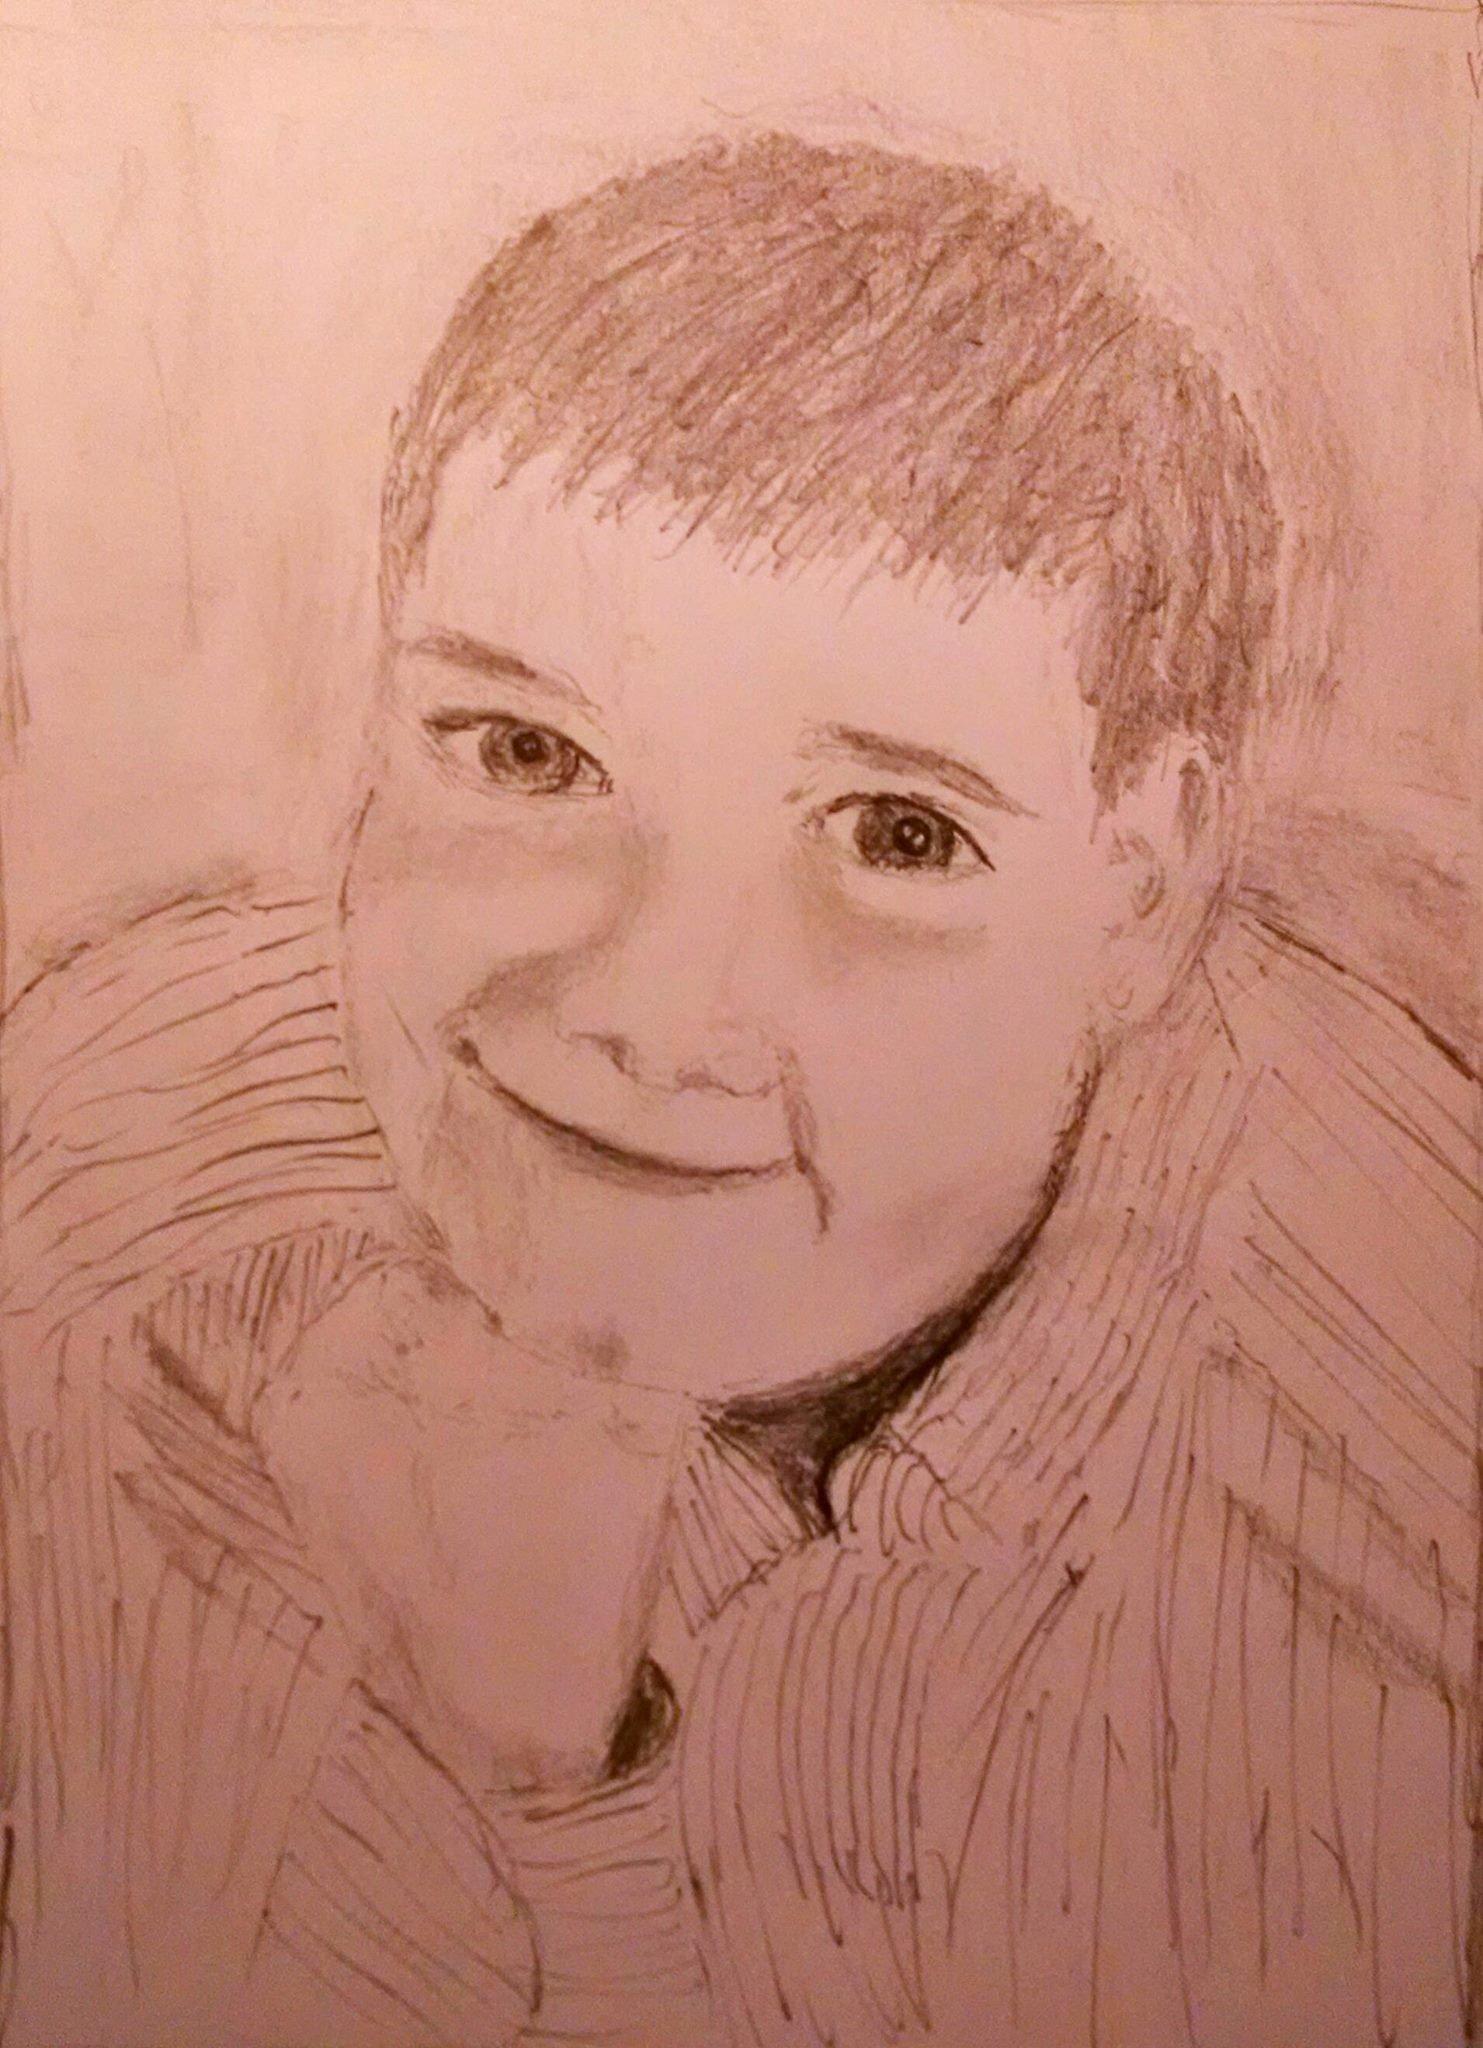 10-16-15 Morning Sketch-12168274_10200699137318736_720712078_o.jpg